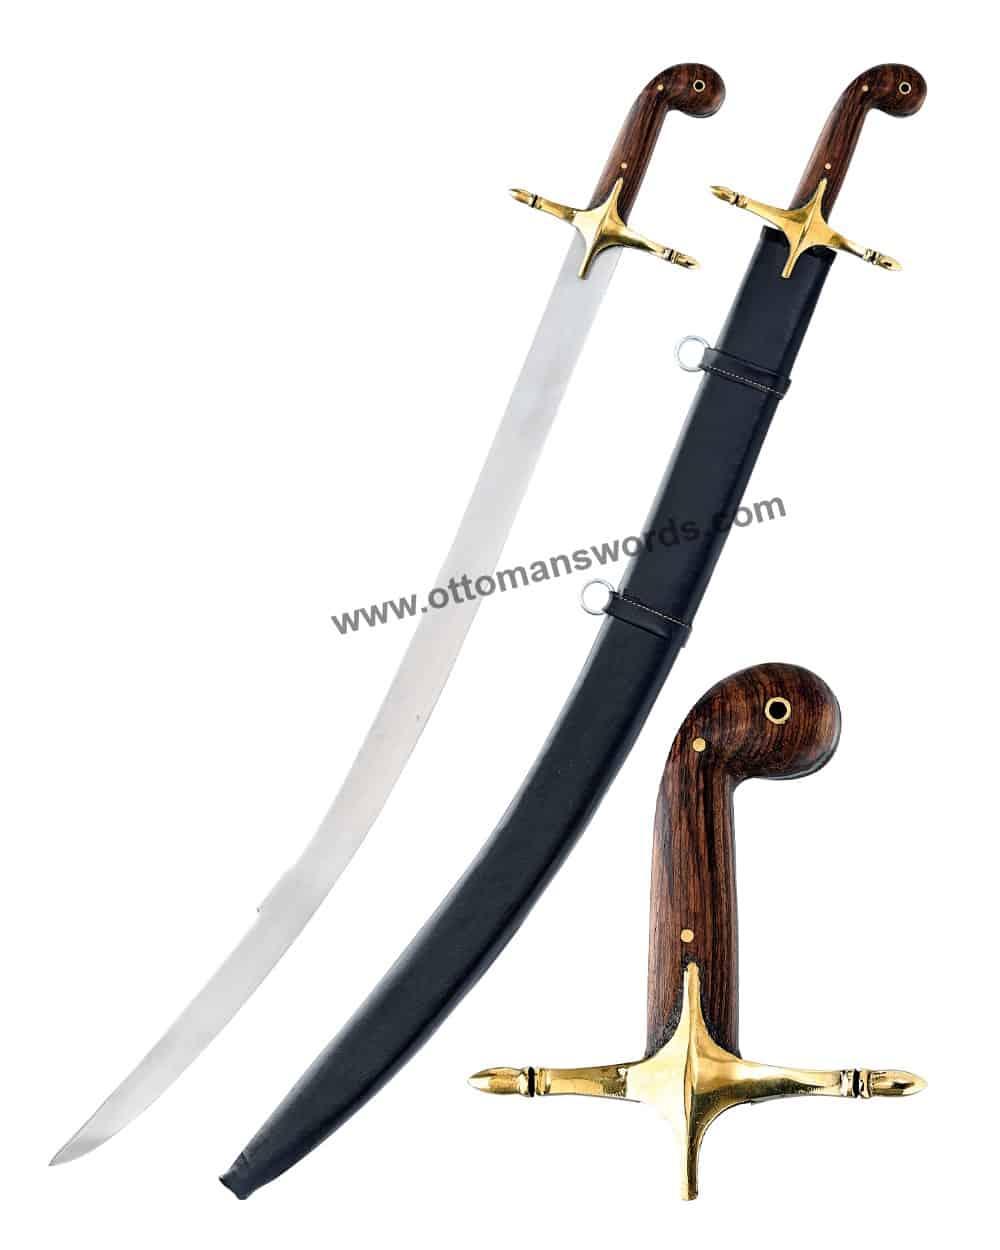 Ottoman Kilij Sword Shop Online